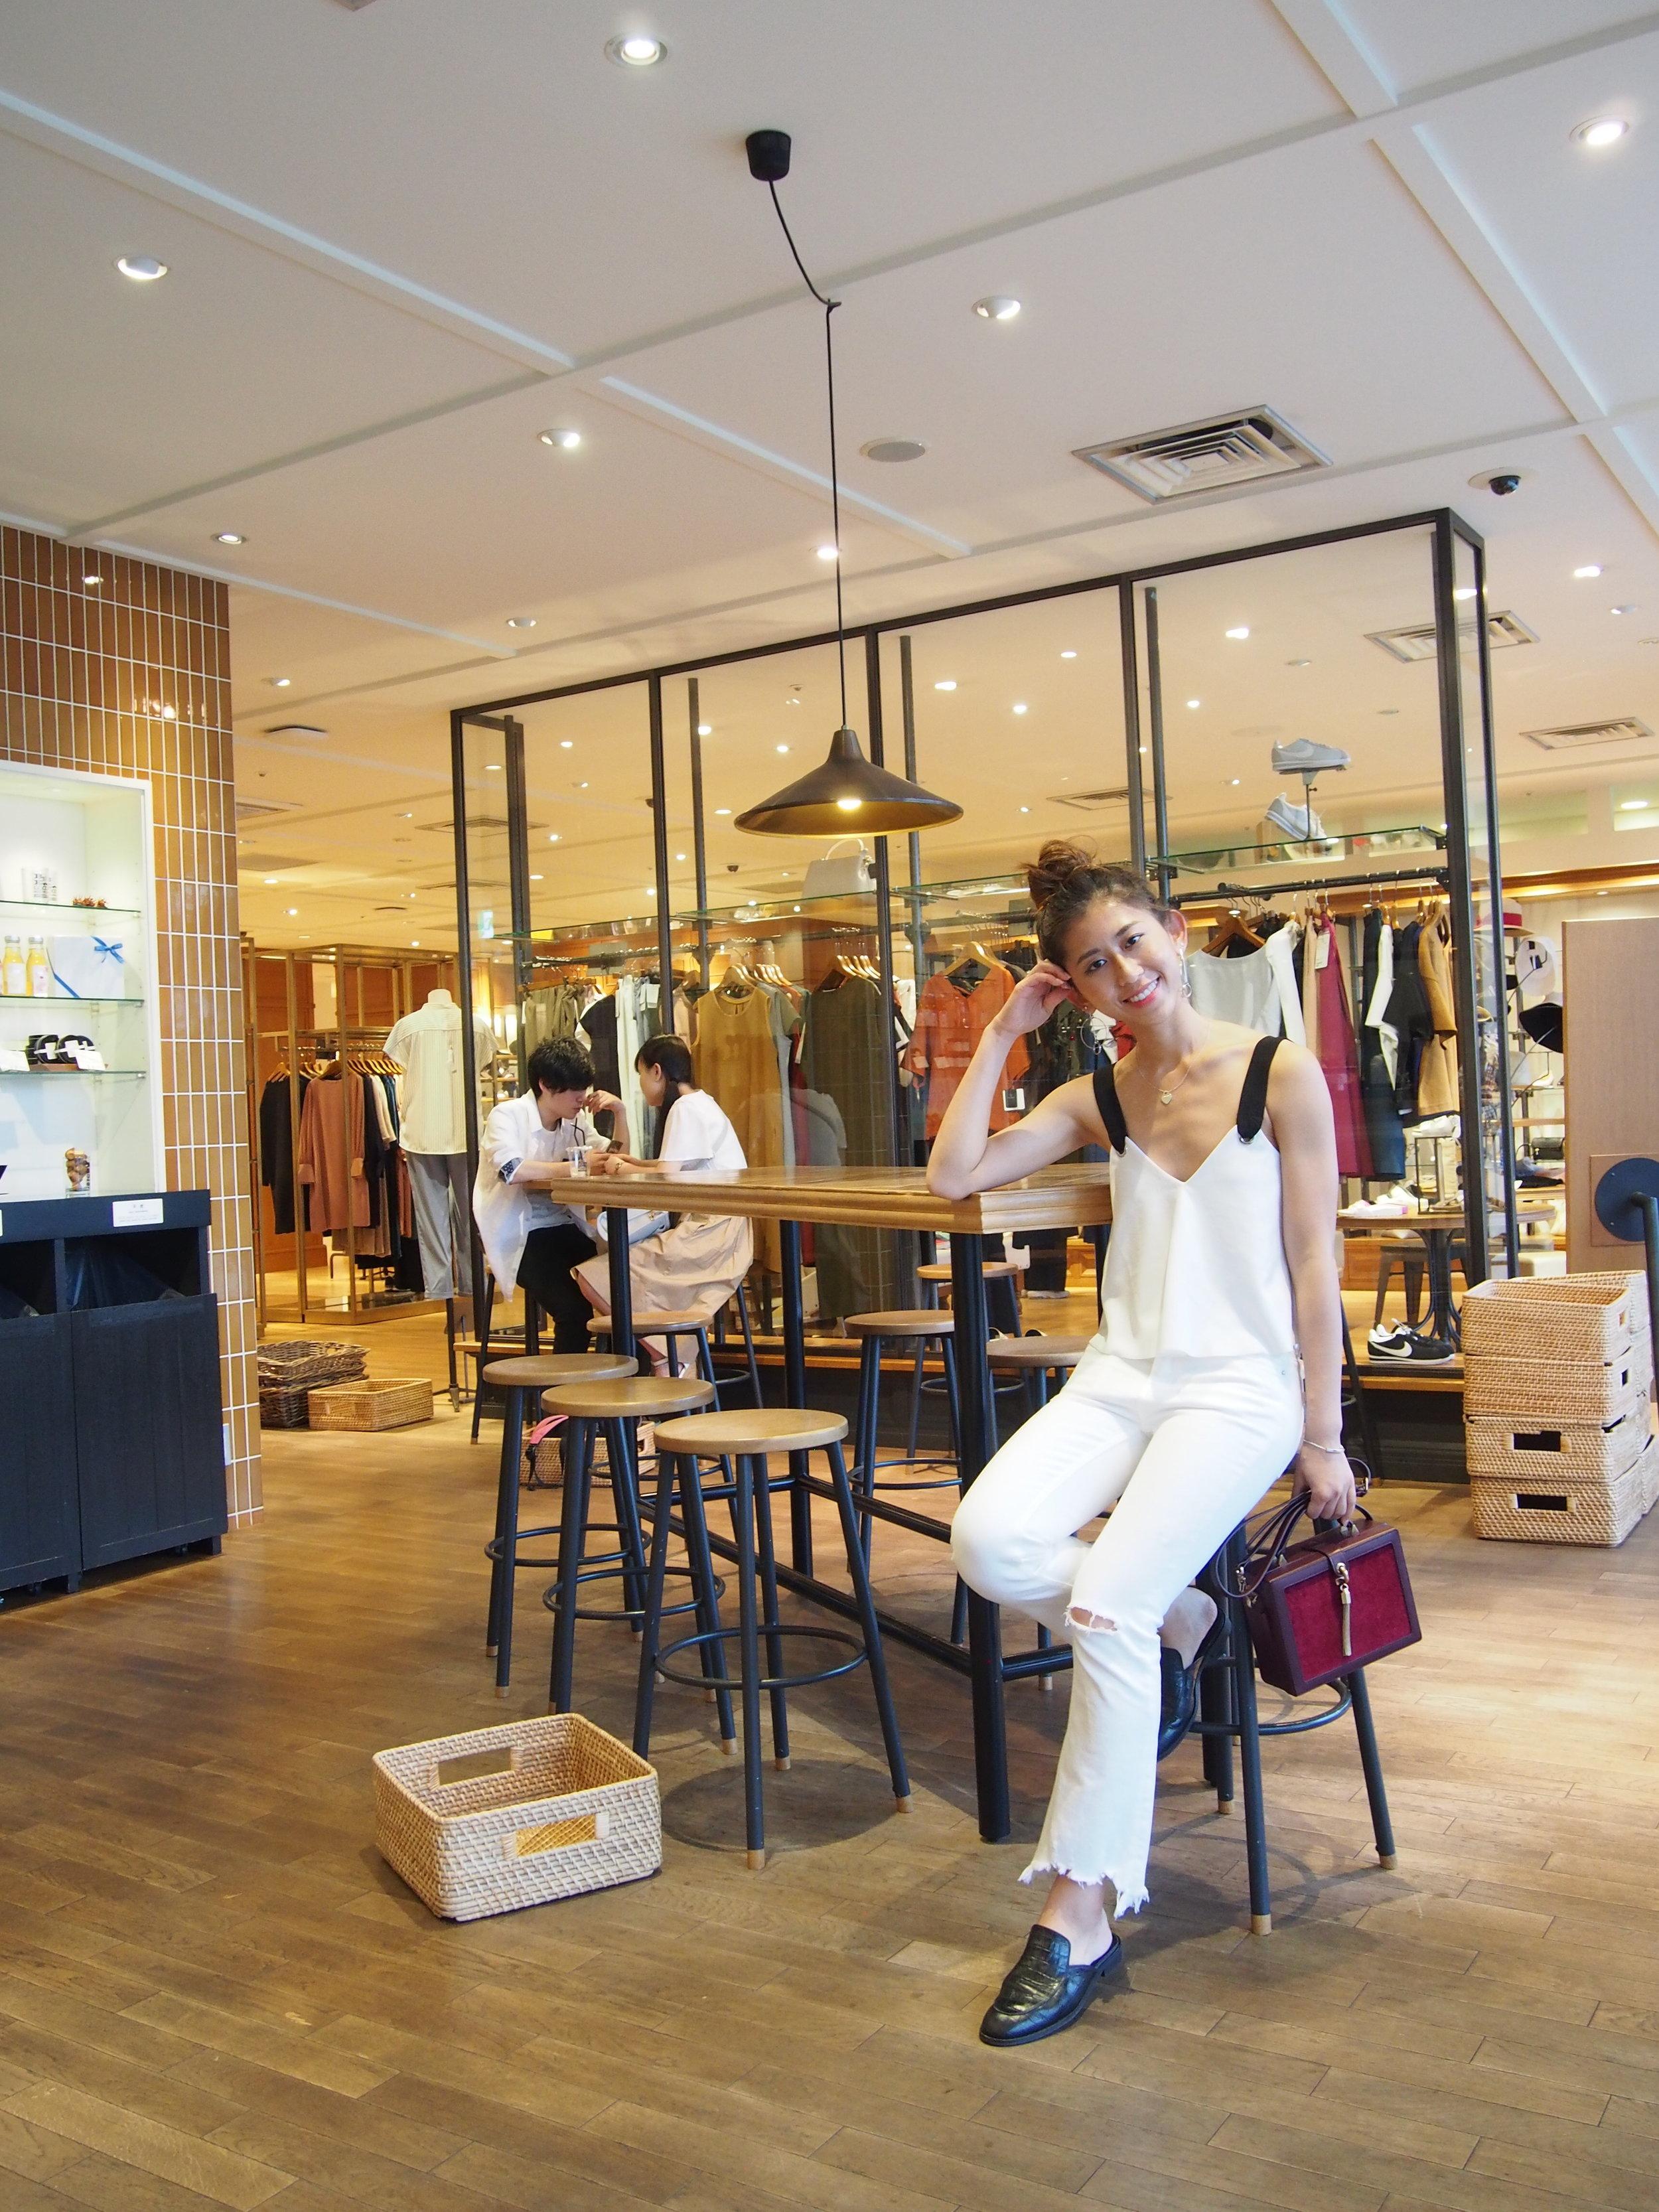 Zara Contrast Crop Top  / Zara mid-rise flared jeans  / Charles & Keith box bag / Giordano Ladies black leather slides